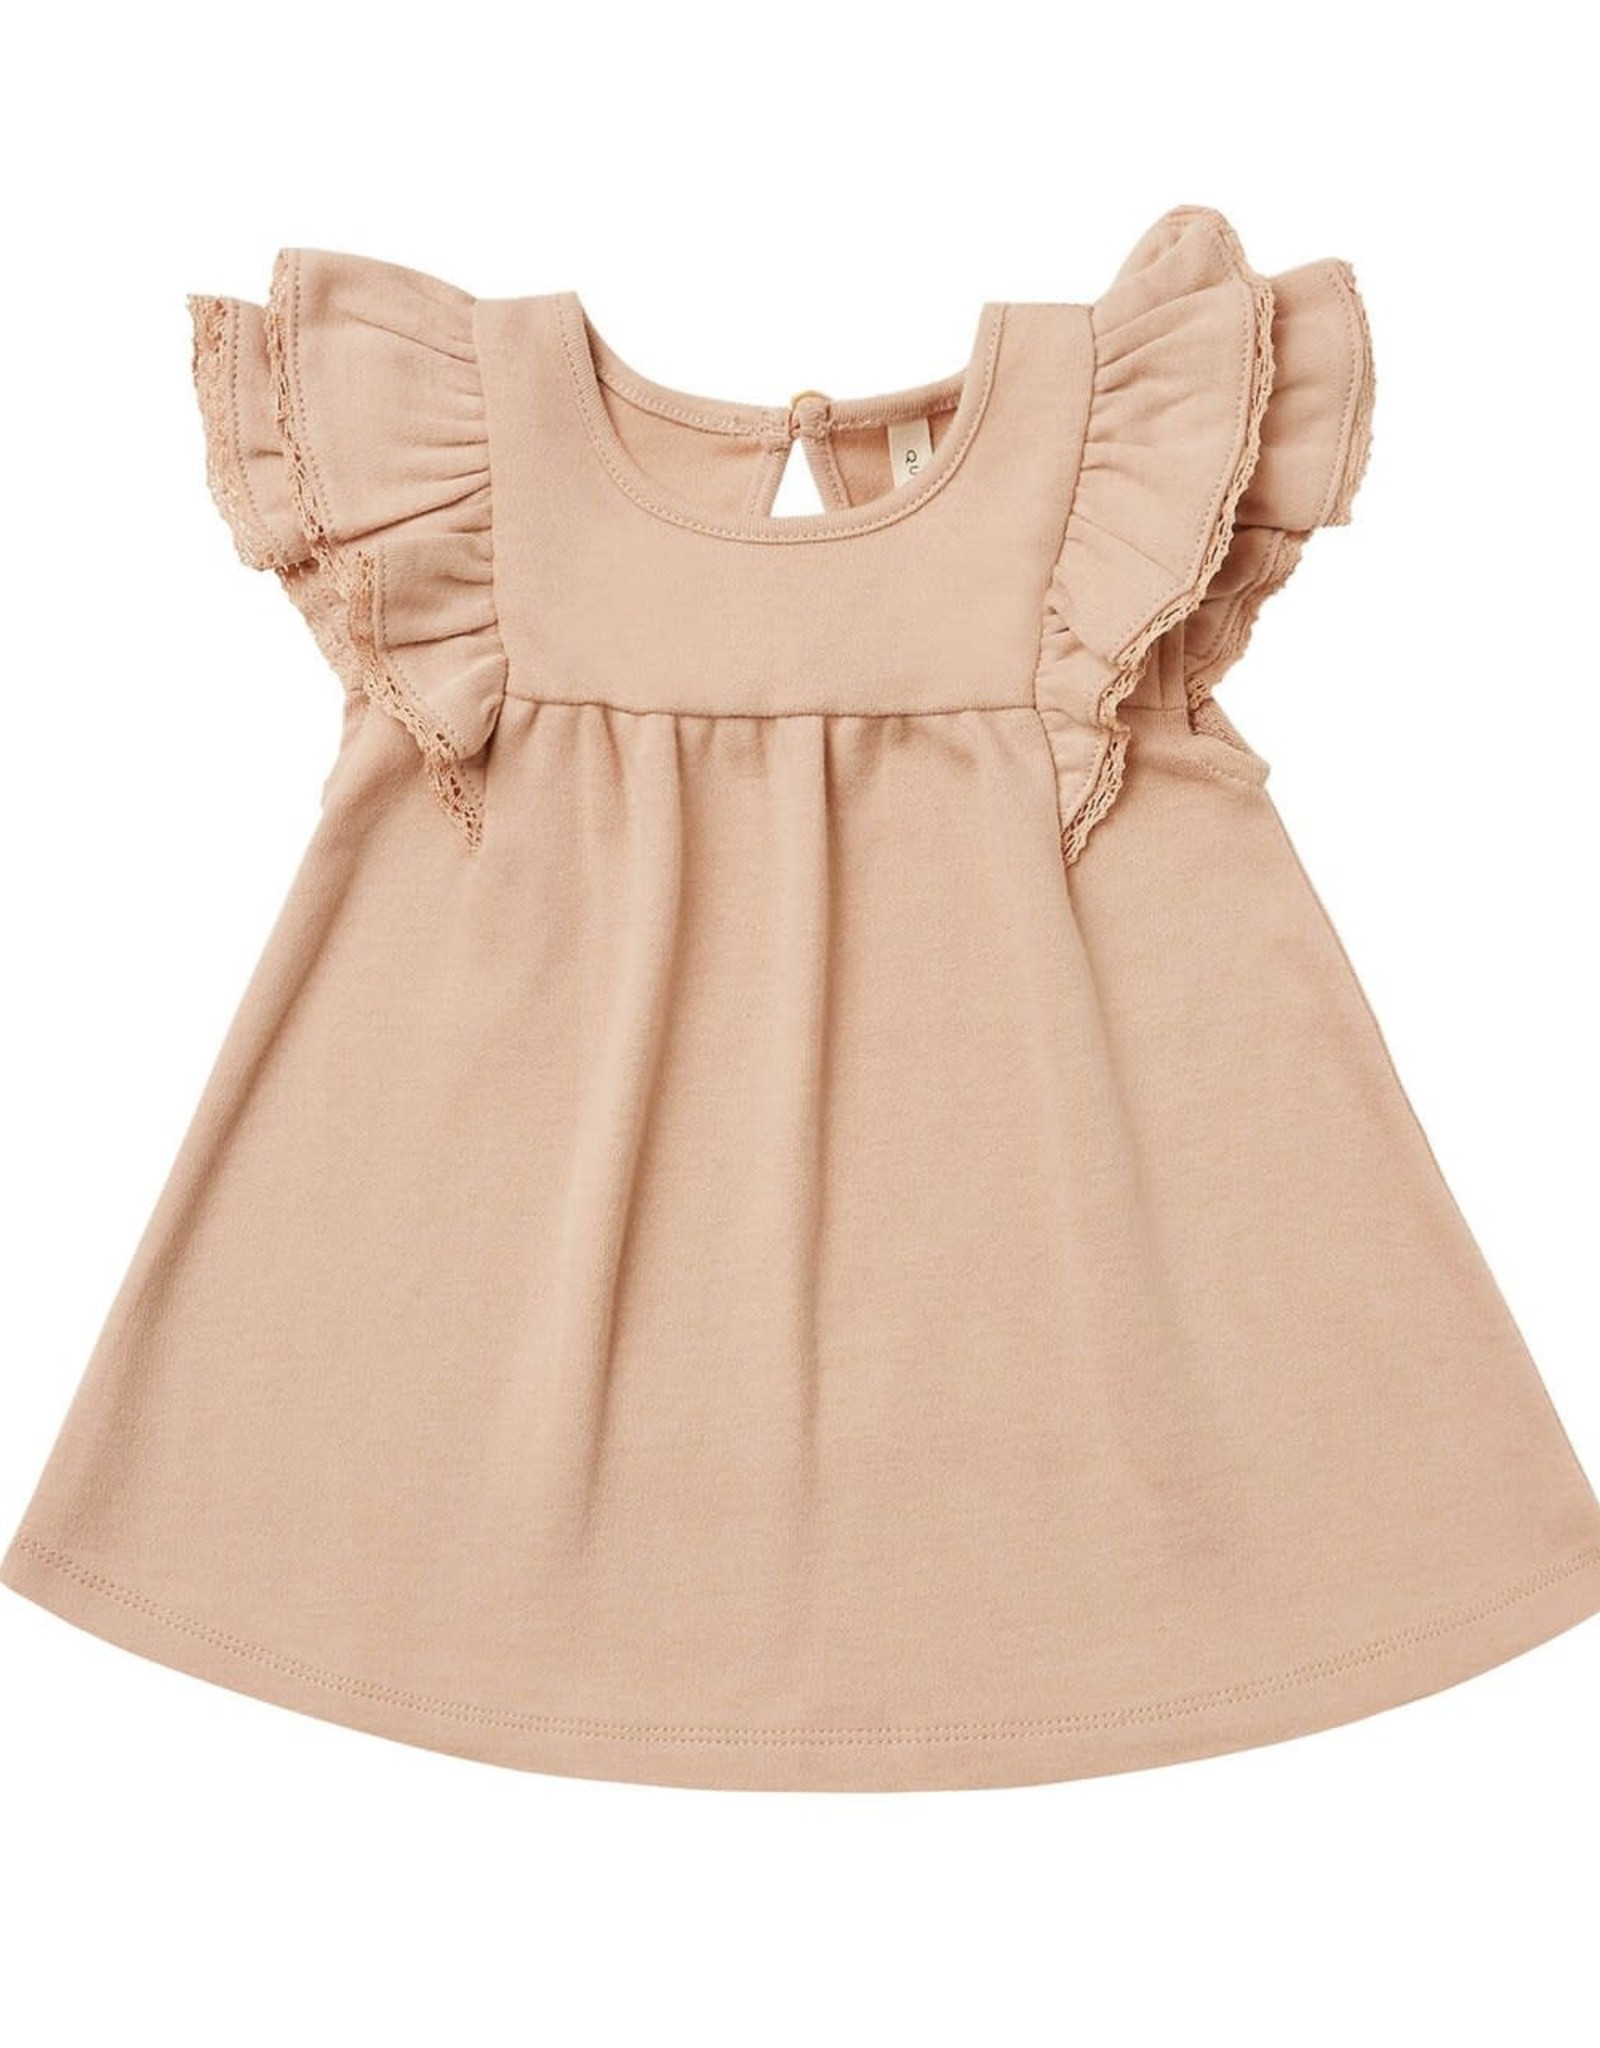 Quincy Mae Quincy Mae Flutter Dress Petal